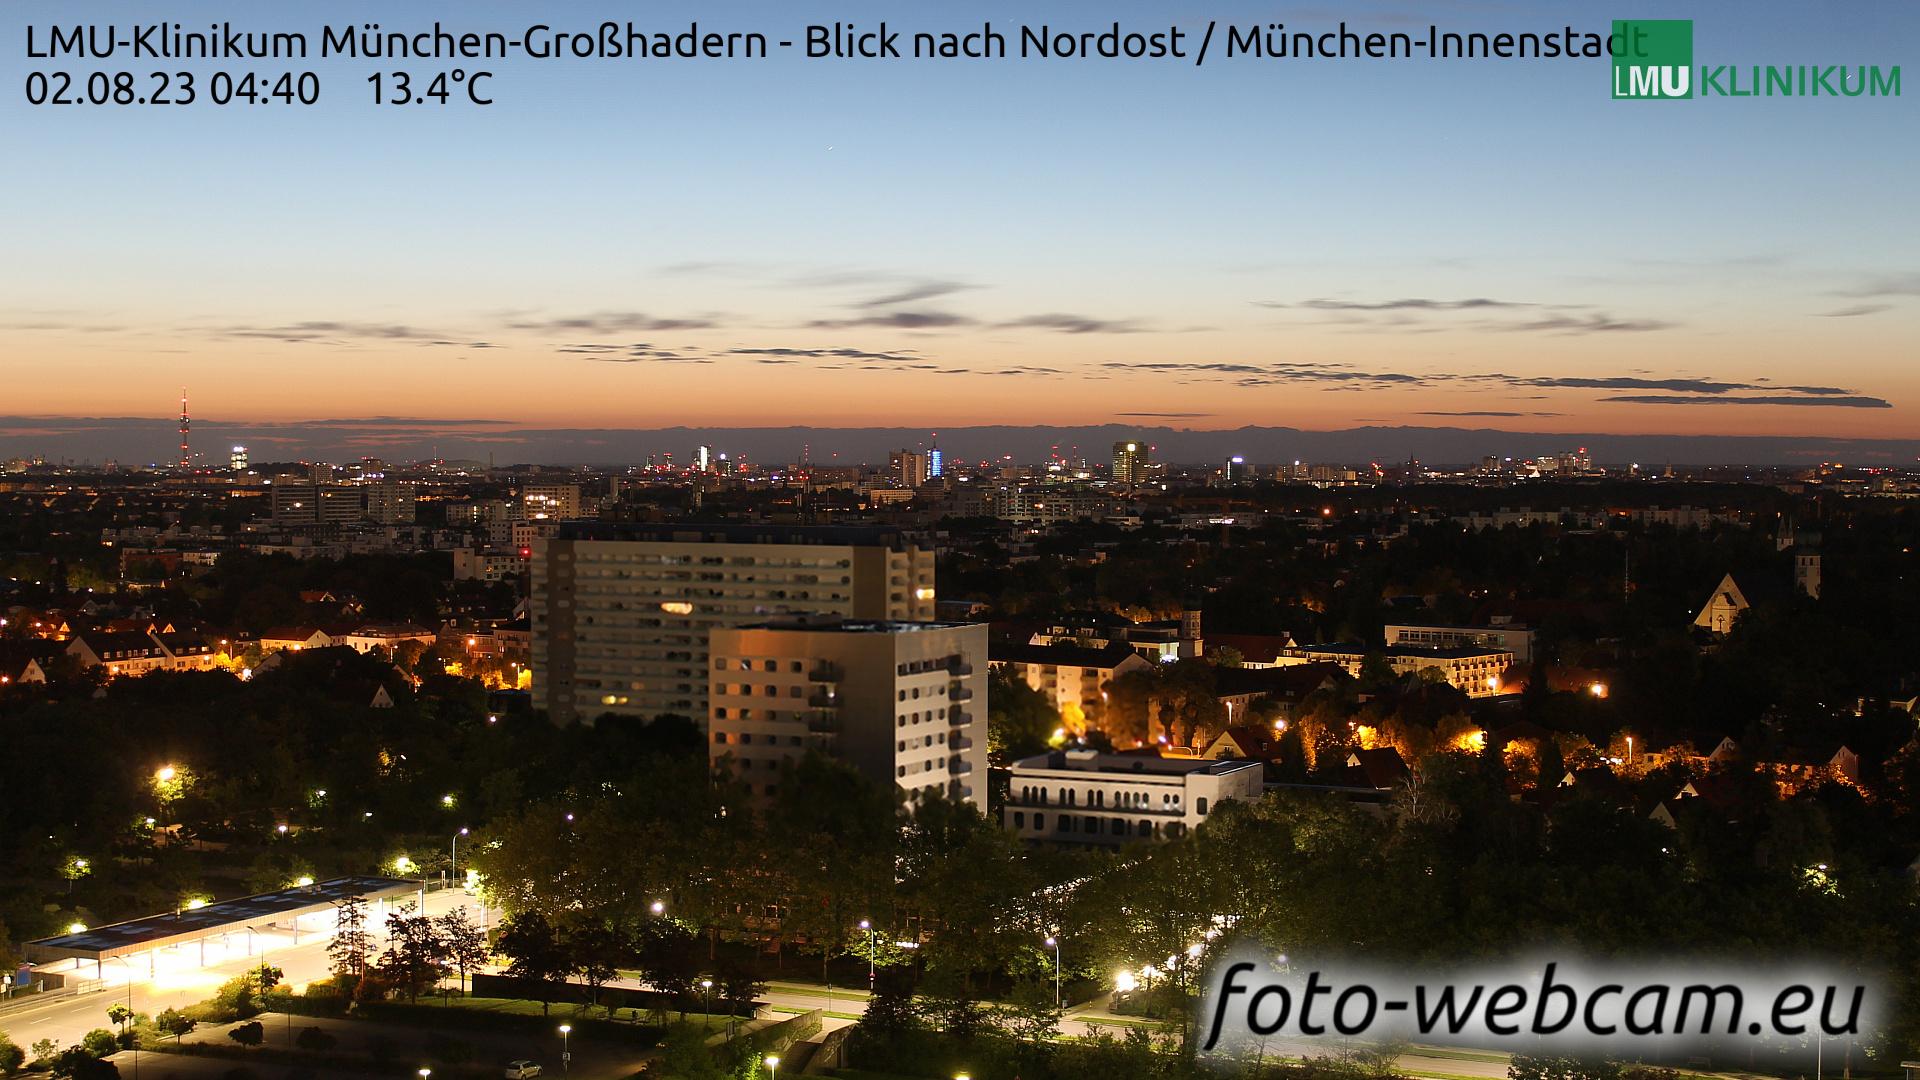 Munich Tue. 04:47